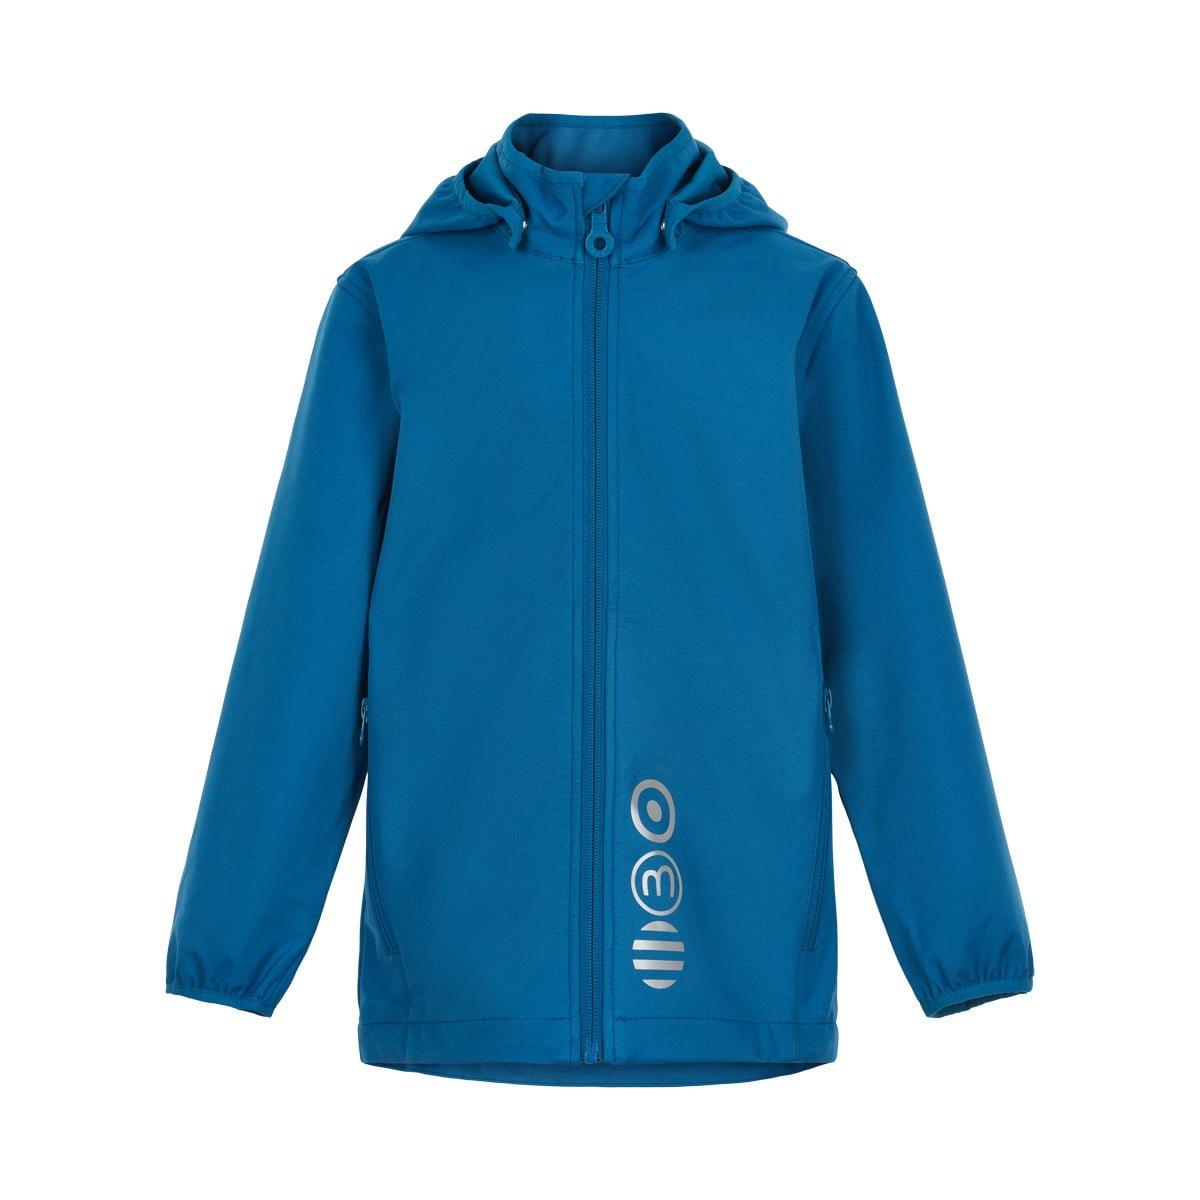 Jachetă de ploaie și vânt (impermeabilă) din softshell Dark Blue Minymo